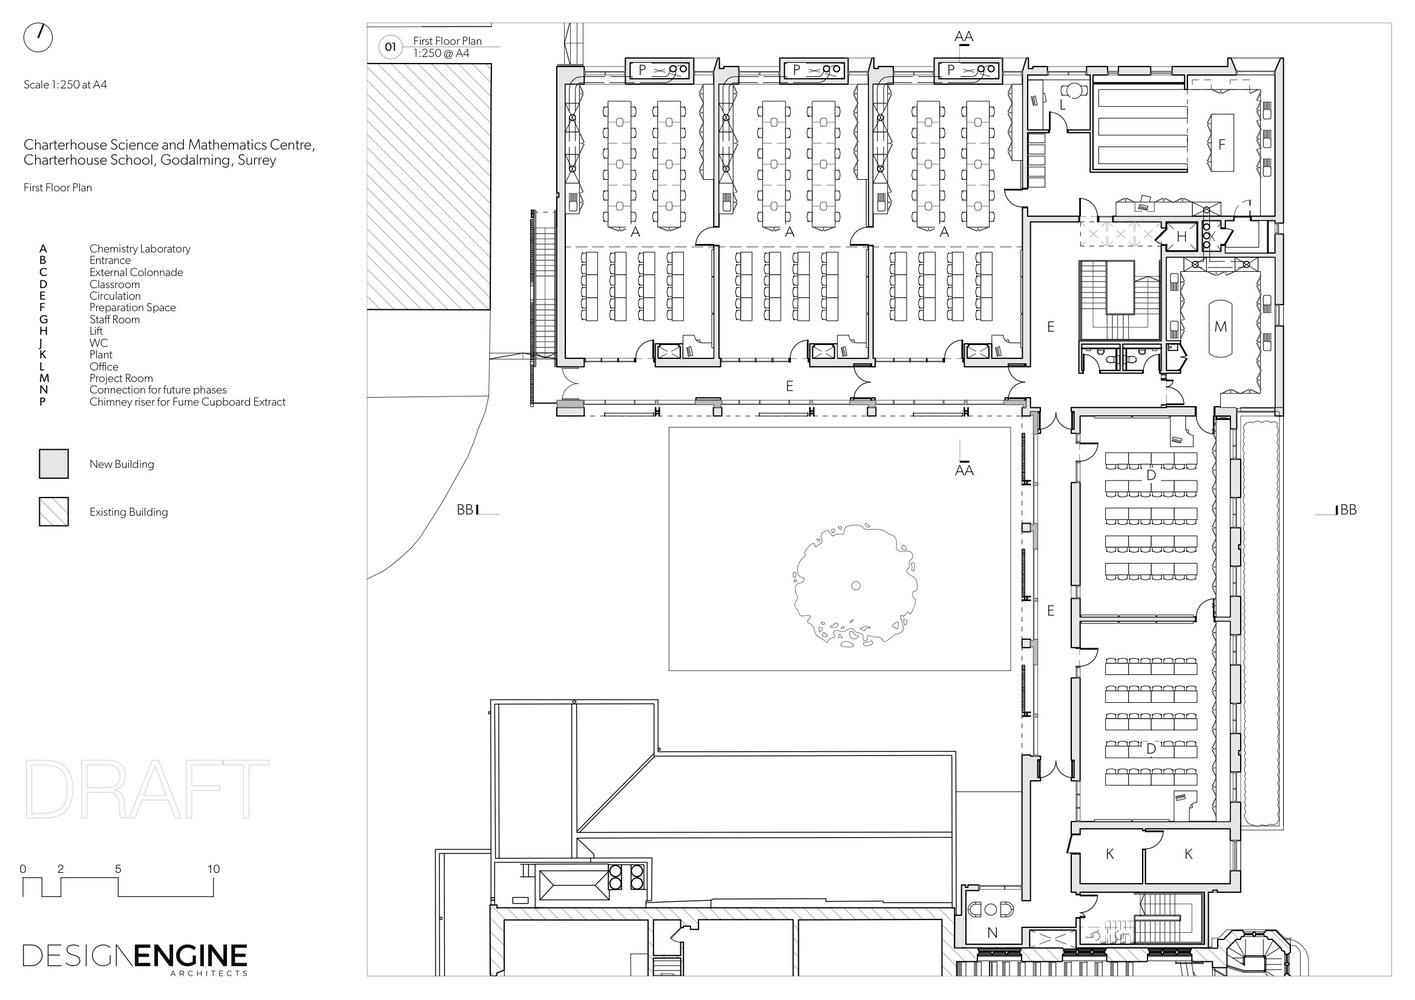 hight resolution of charterhouse science mathematics centre design engine architects first floor plan